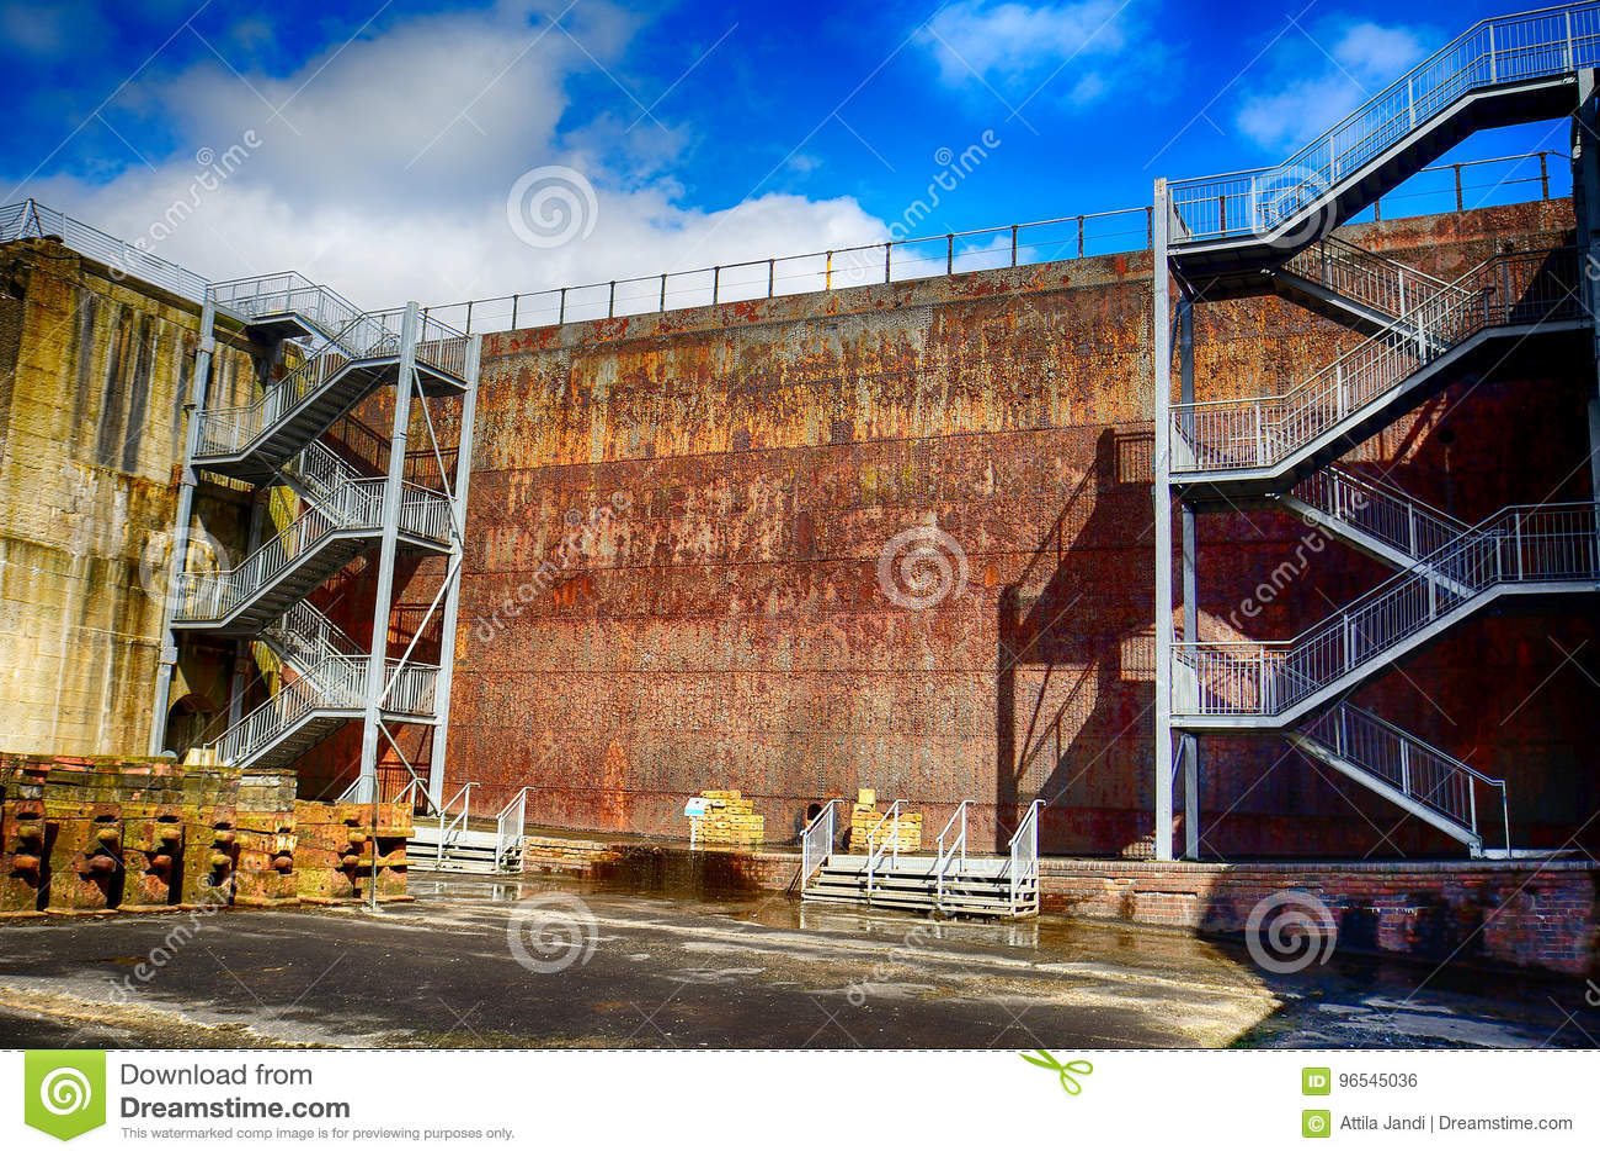 thompson graving dock belfast nor editorial photo image of irish